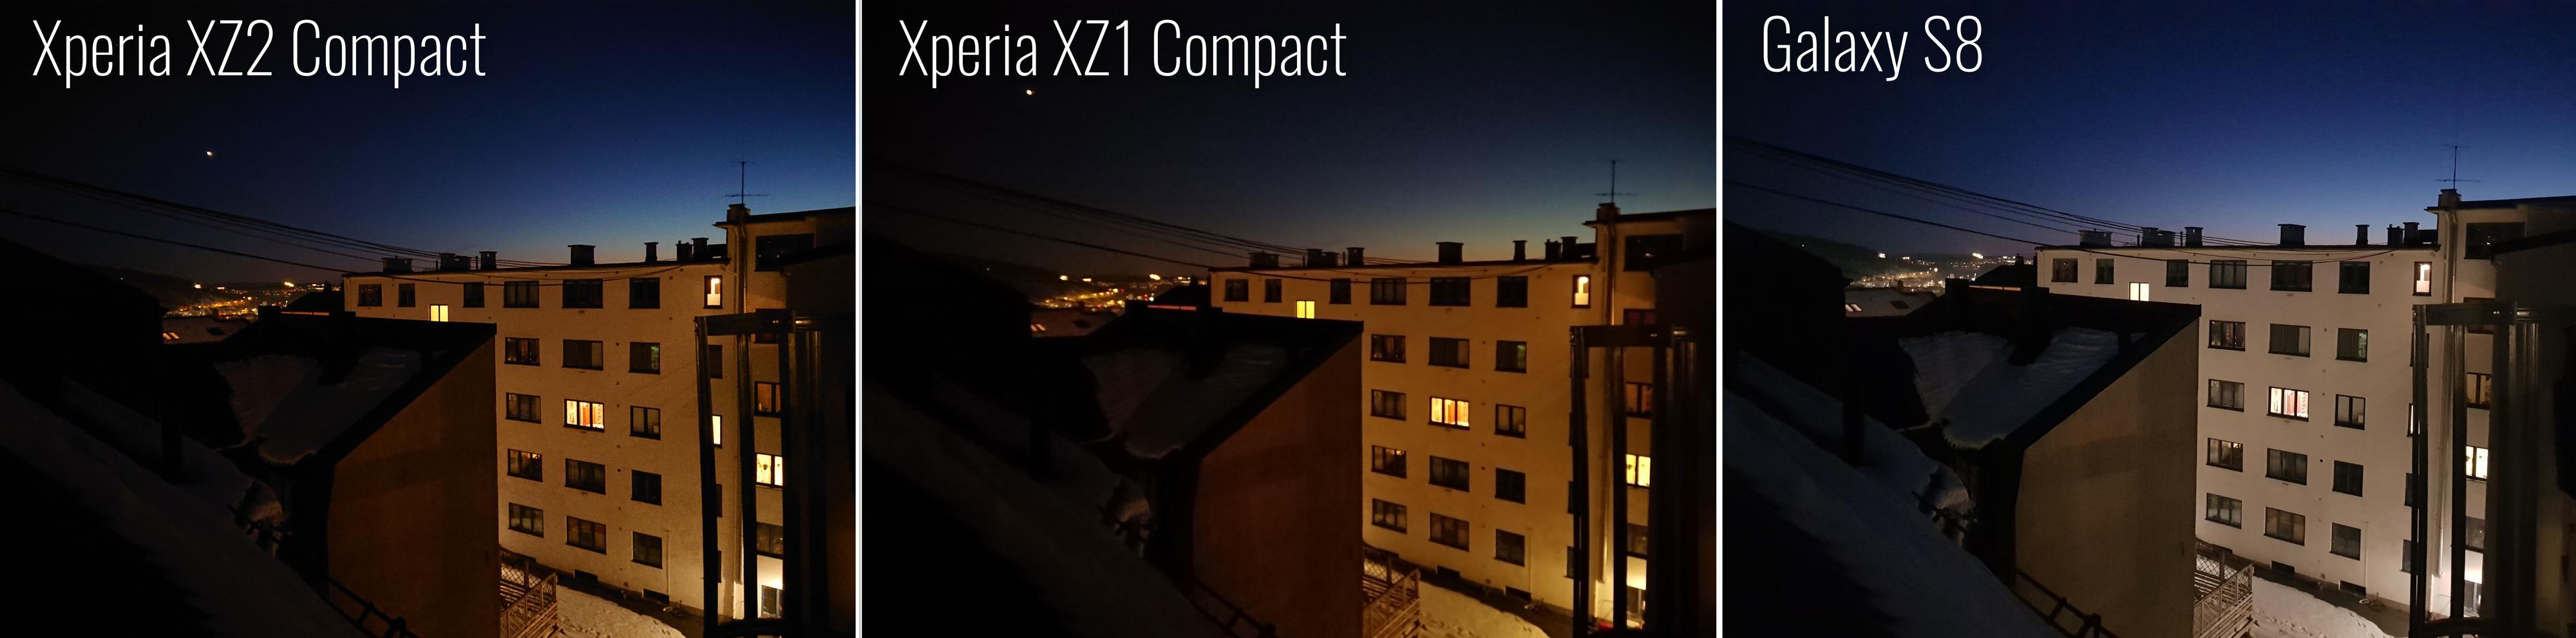 Galaxy S8 tar innersvingen på XZ2 Compact i mørke omgivelser.